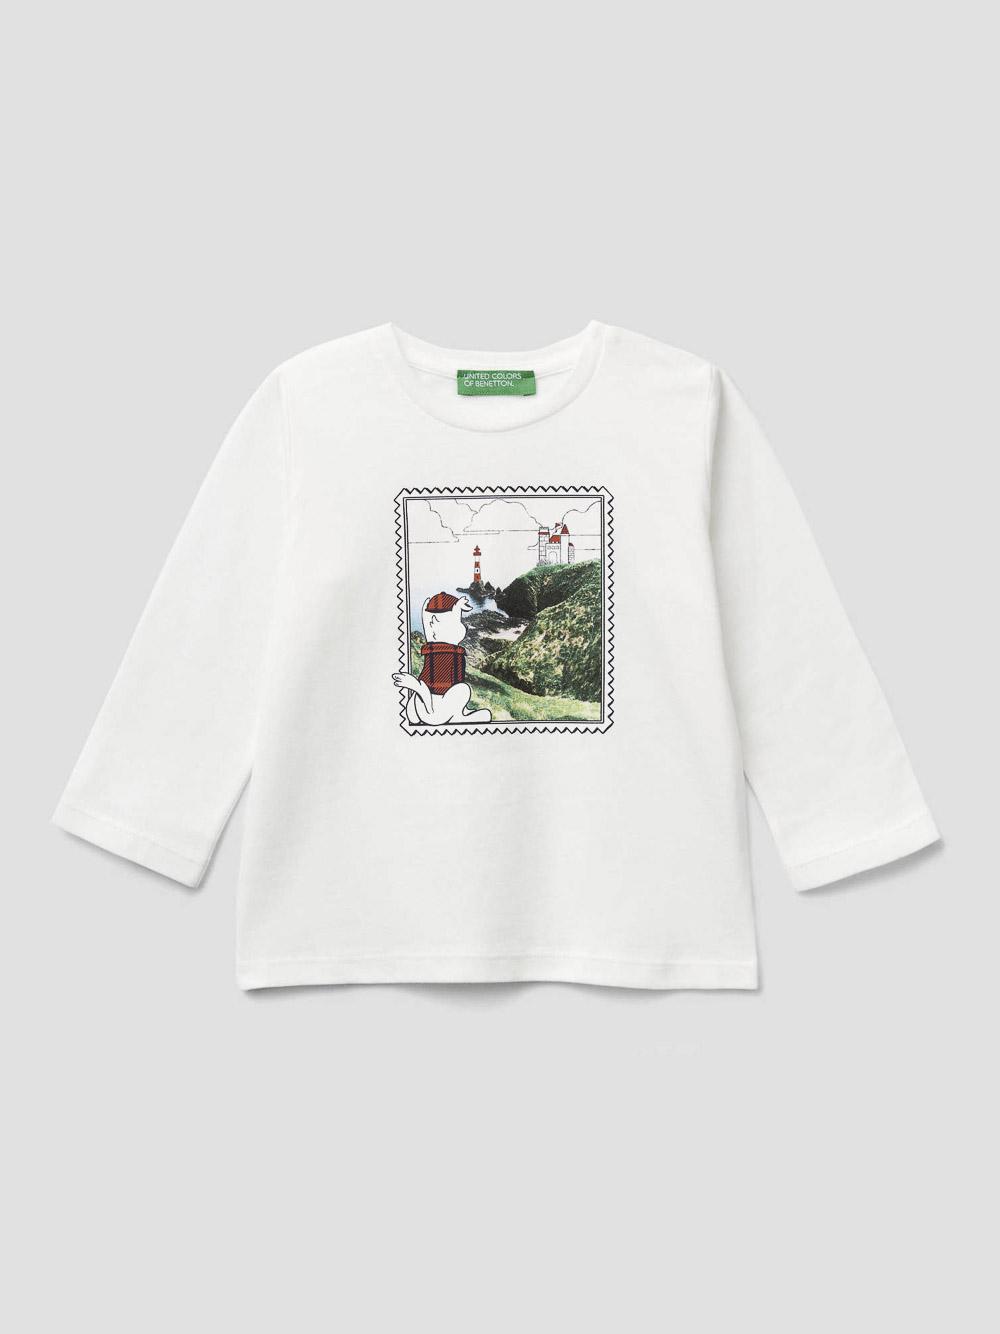 012 BENETTON T-shirt με τύπωμα καρτ ποστάλ 3VR5C14UL 20A074